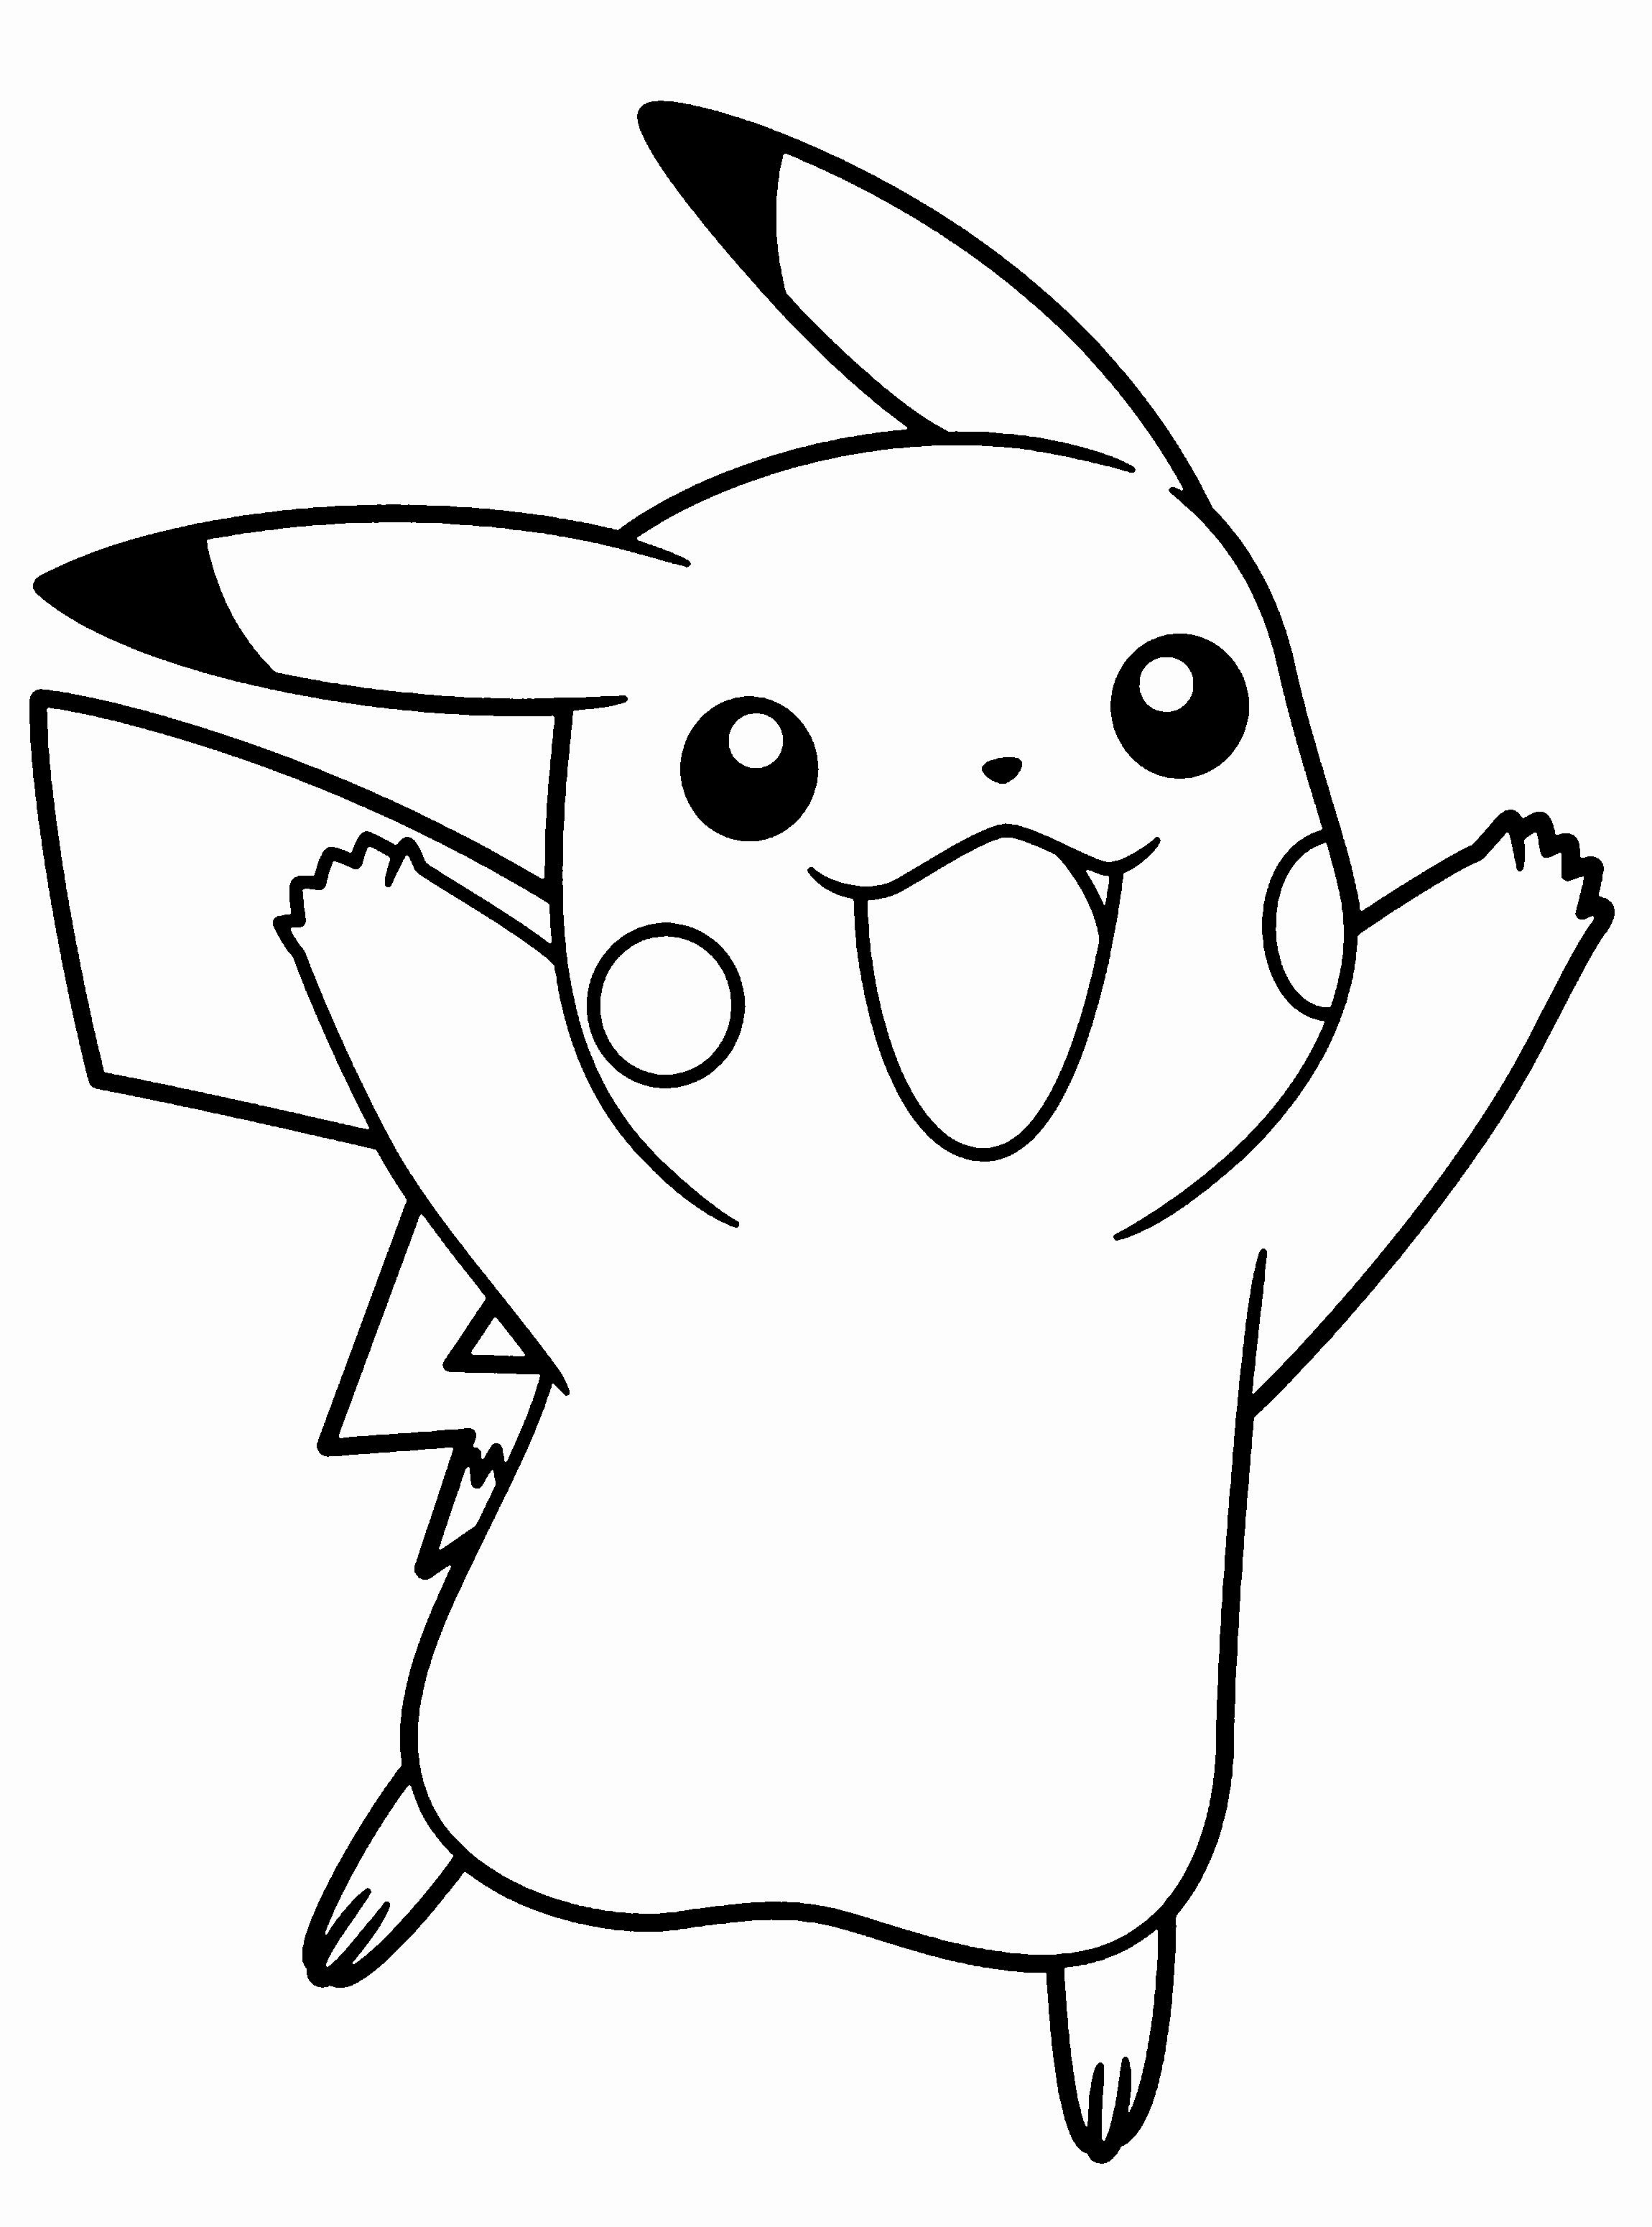 Coloriage Raichu Pokemon Nouveau Pokemon  Beau Pokemon pour Coloriage Pokemon Raichu